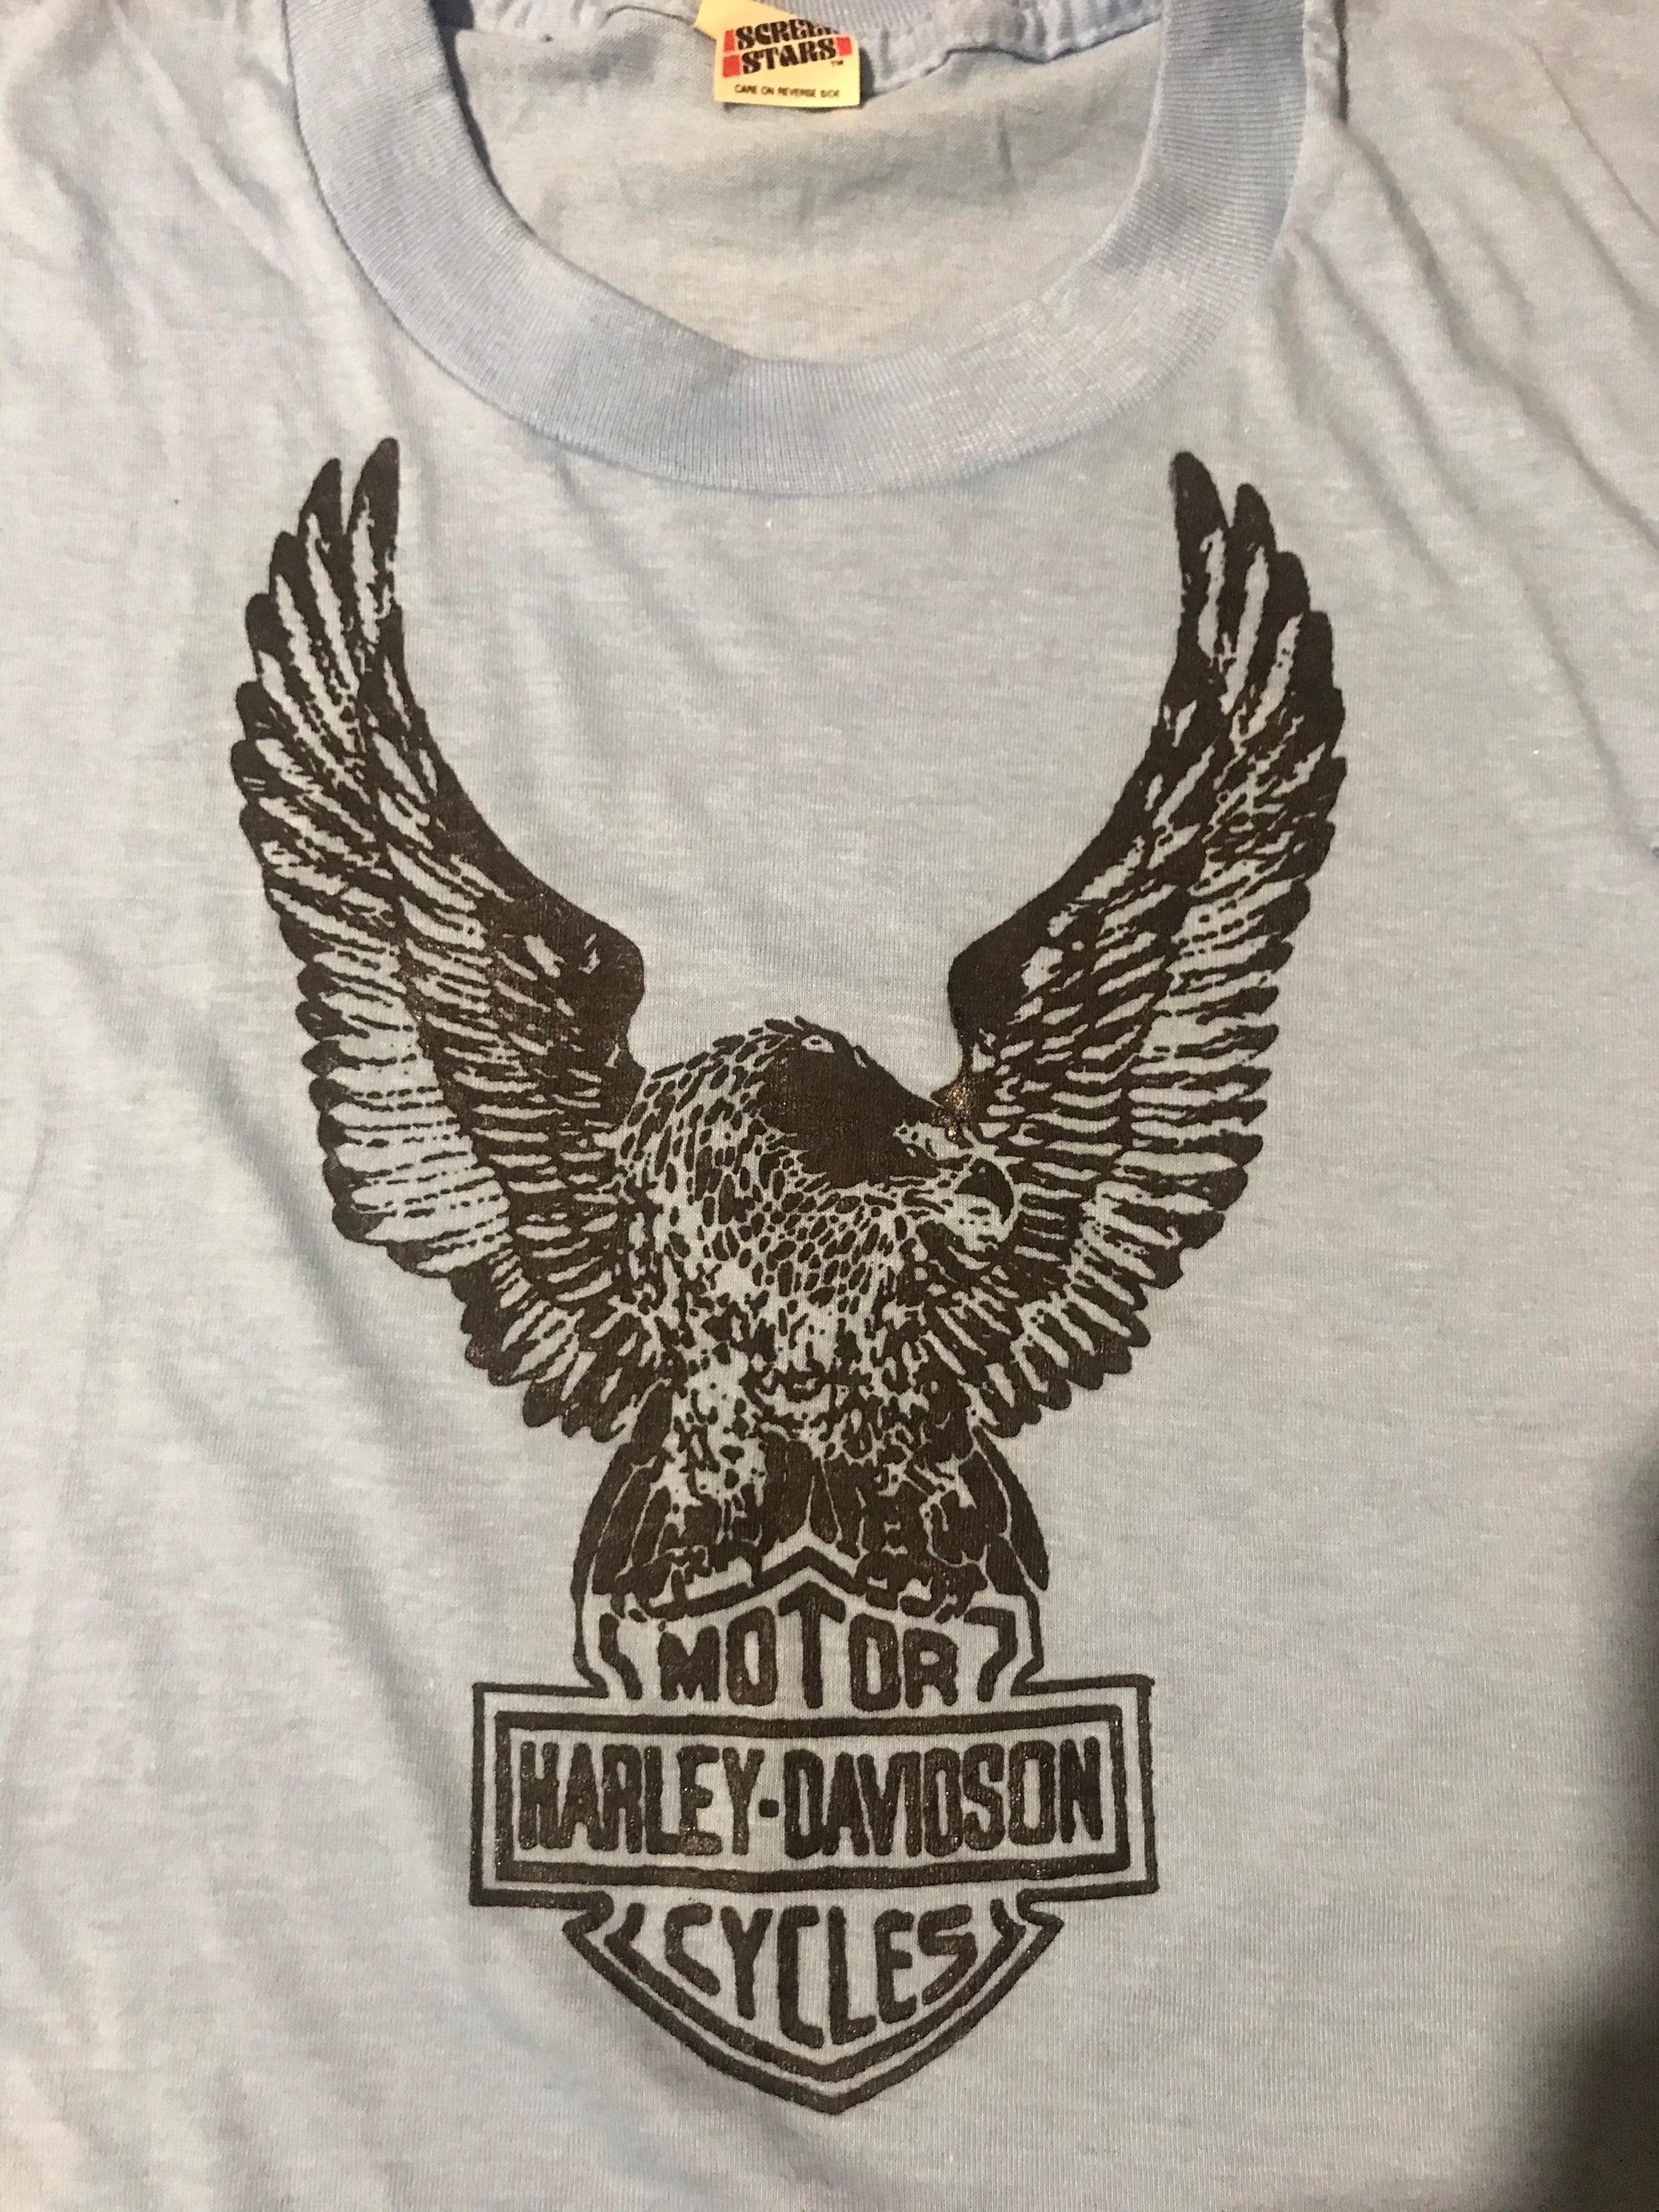 Vintage Harley Davidson print on Deadstock screen stars cropped T-shirt size large